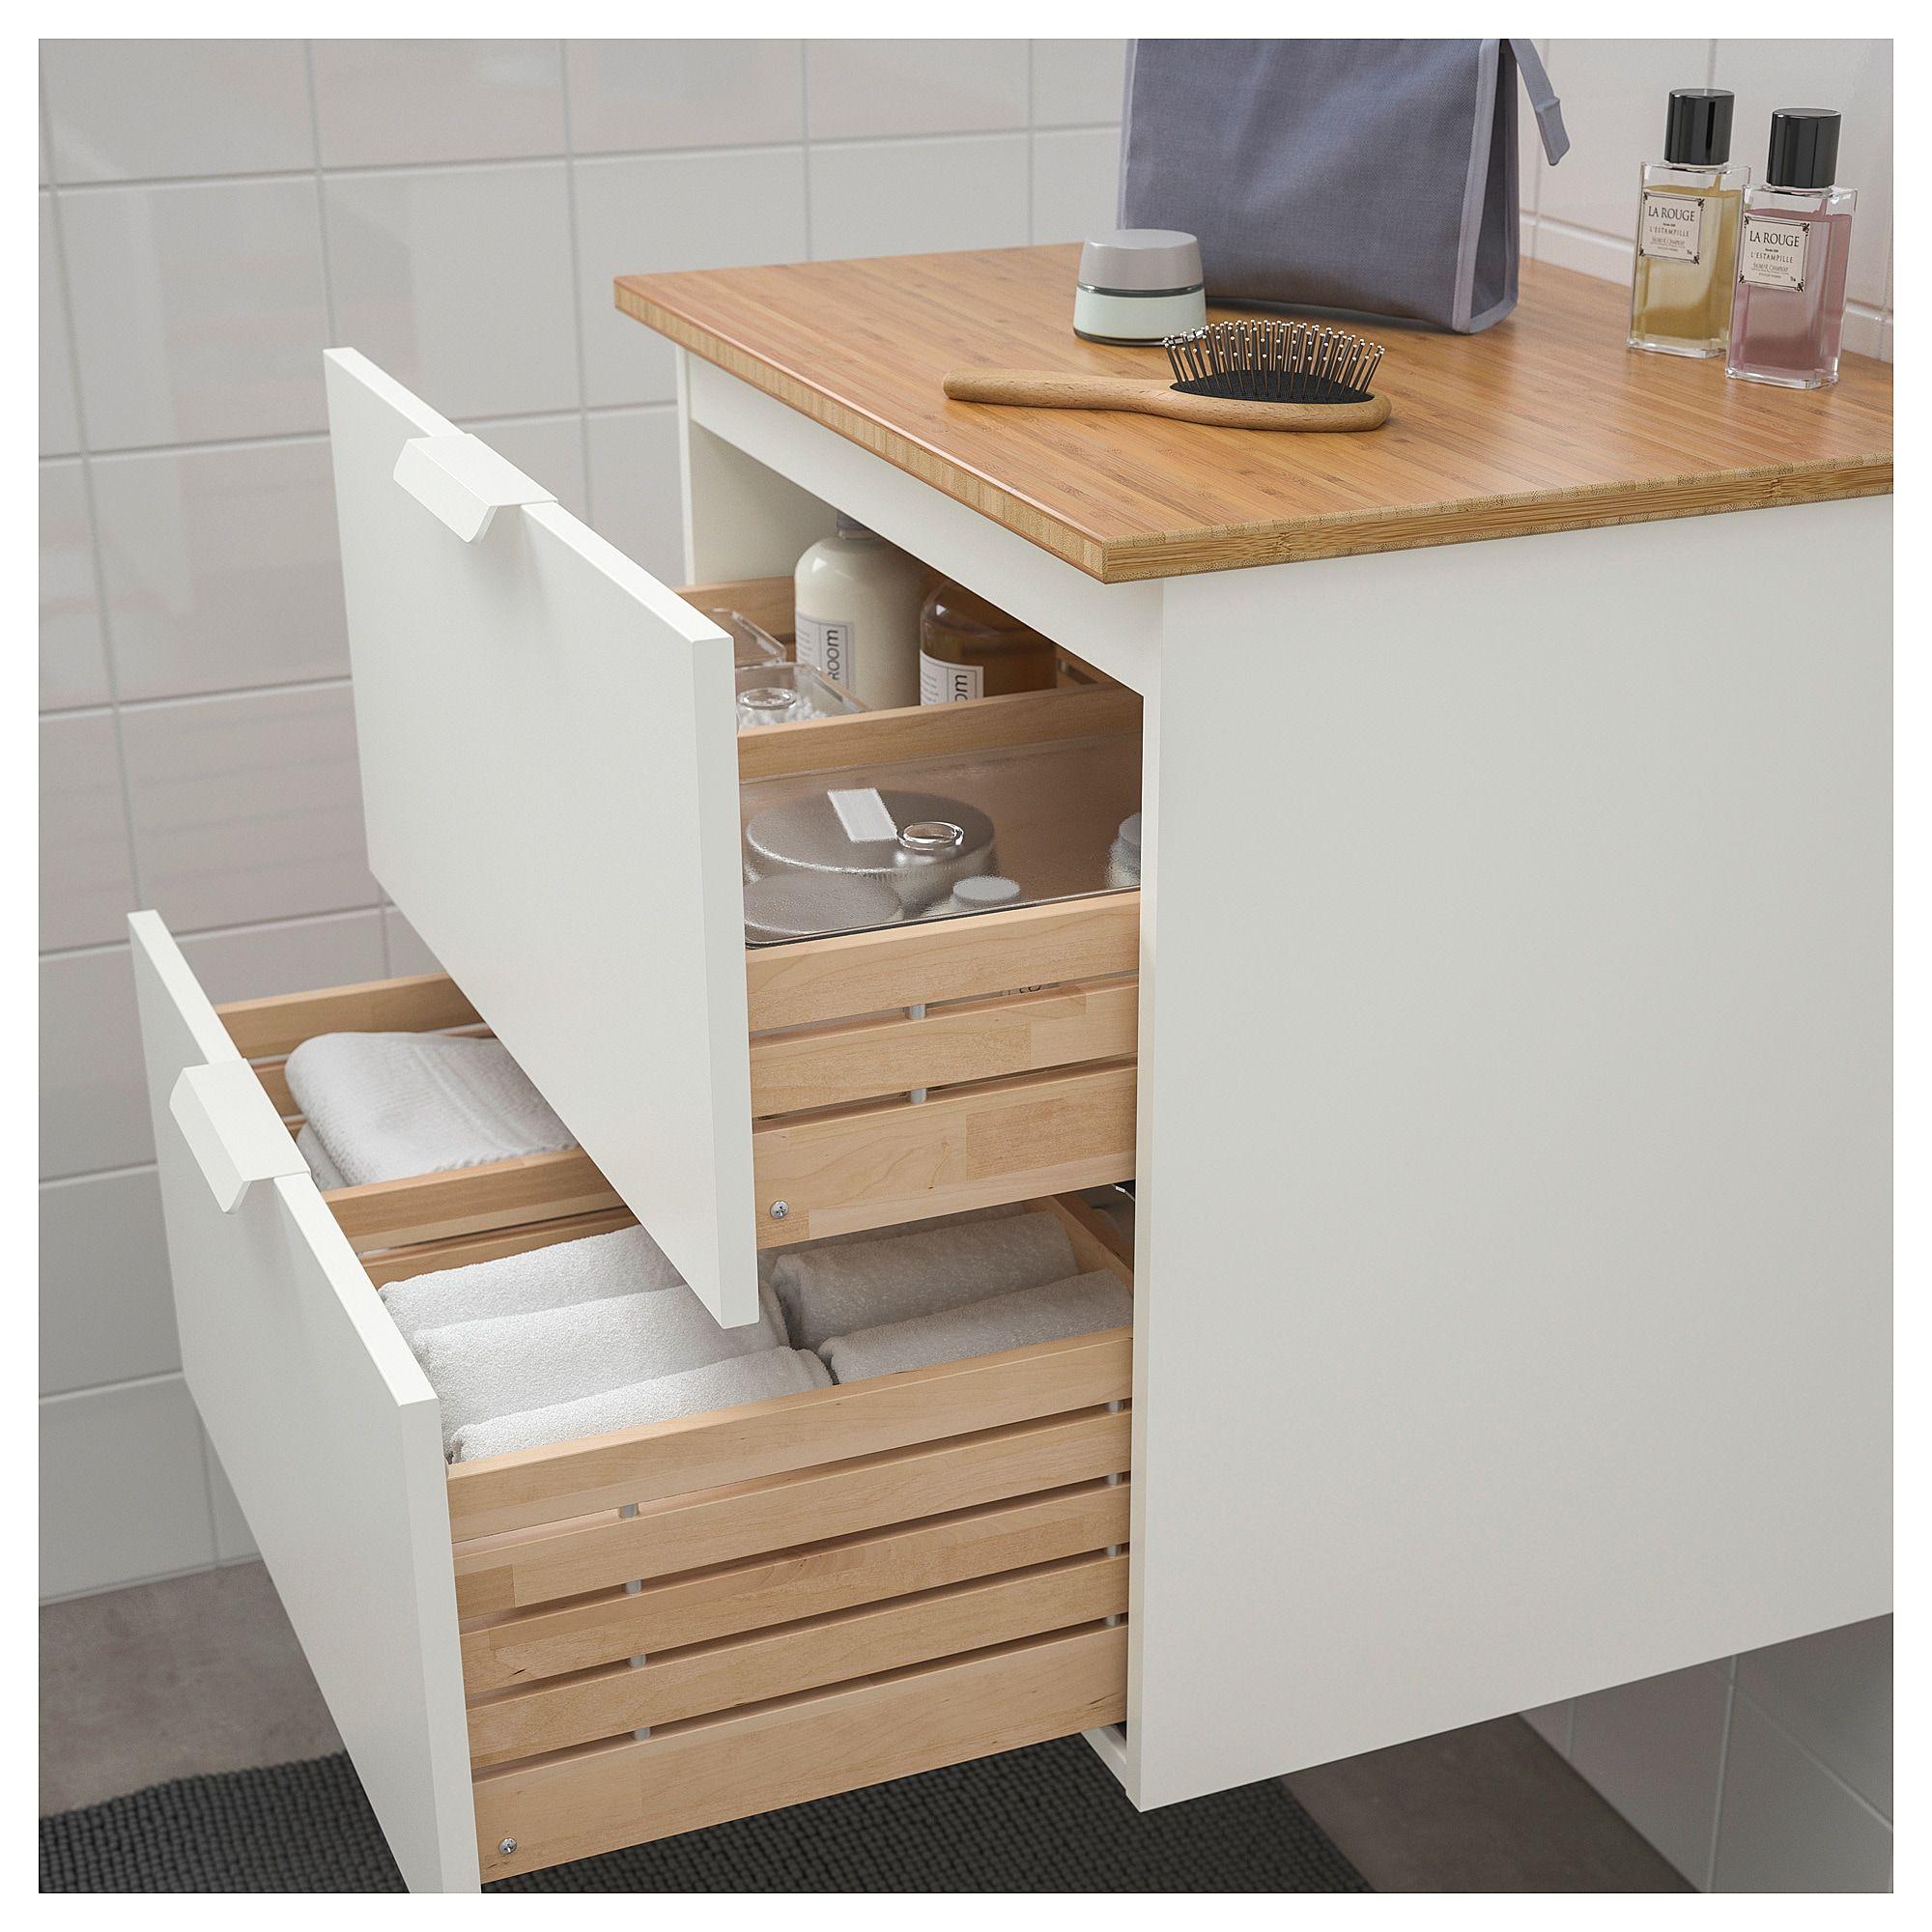 Plan De Travail Ikea Bois Massif godmorgon / tolken bathroom vanity - white, bamboo | meuble